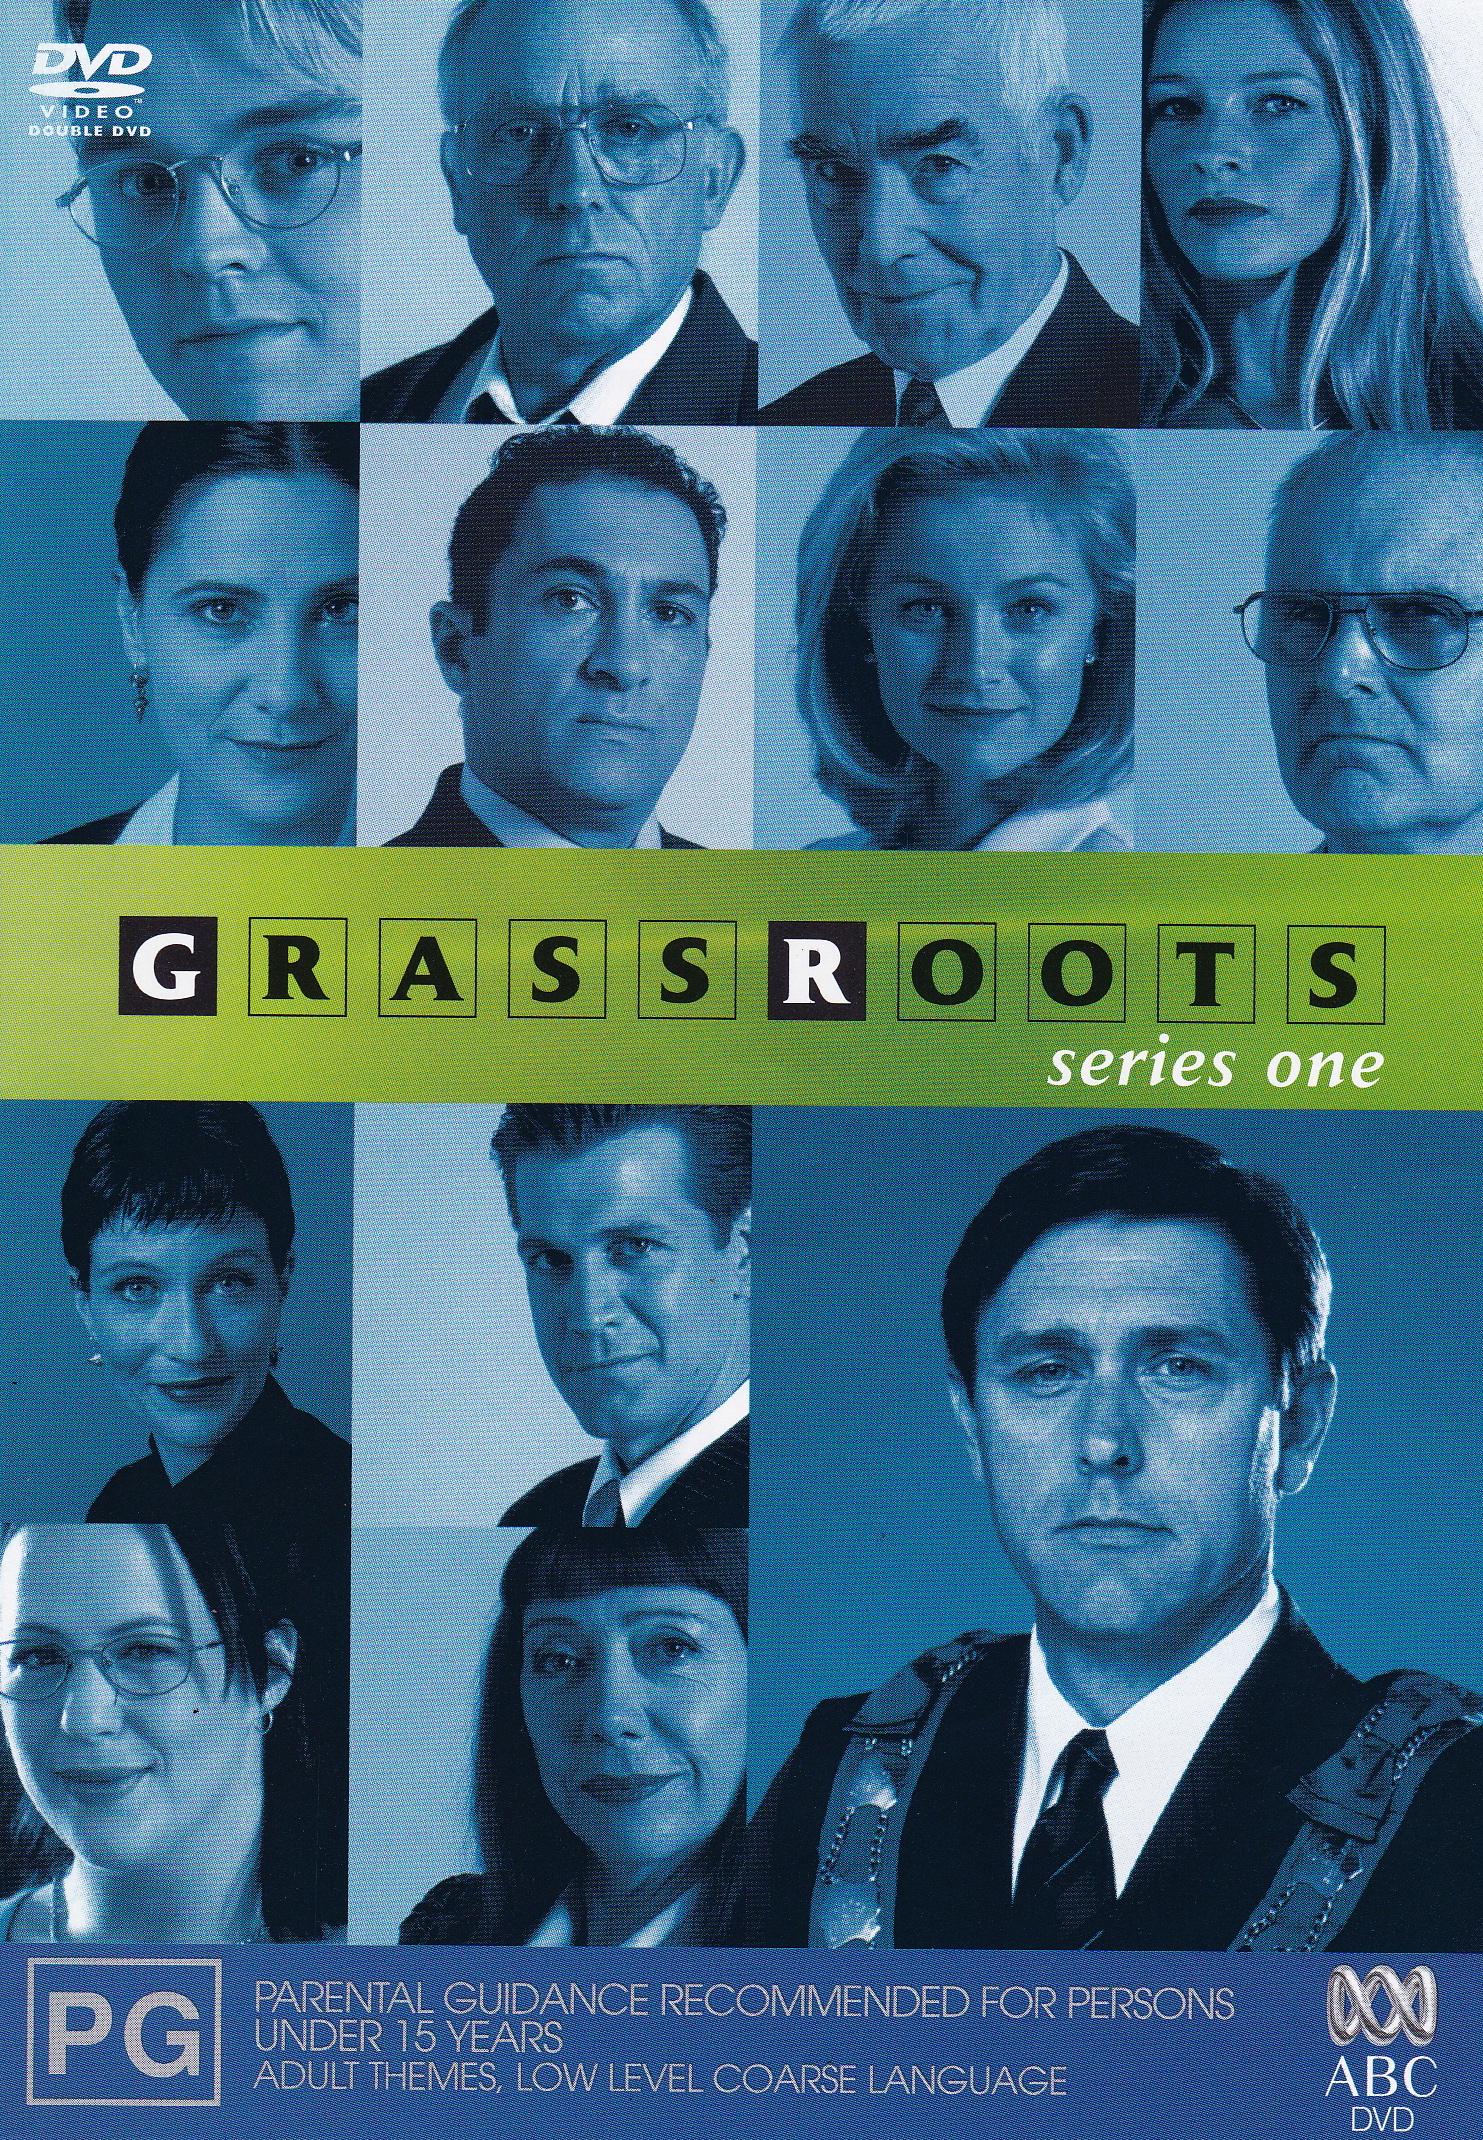 Zoe Carides, John Clayton, Rhondda Findleton, Chris Haywood, Tammy Macintosh, Geoff Morrell, and Rhys Muldoon in Grass Roots (2000)